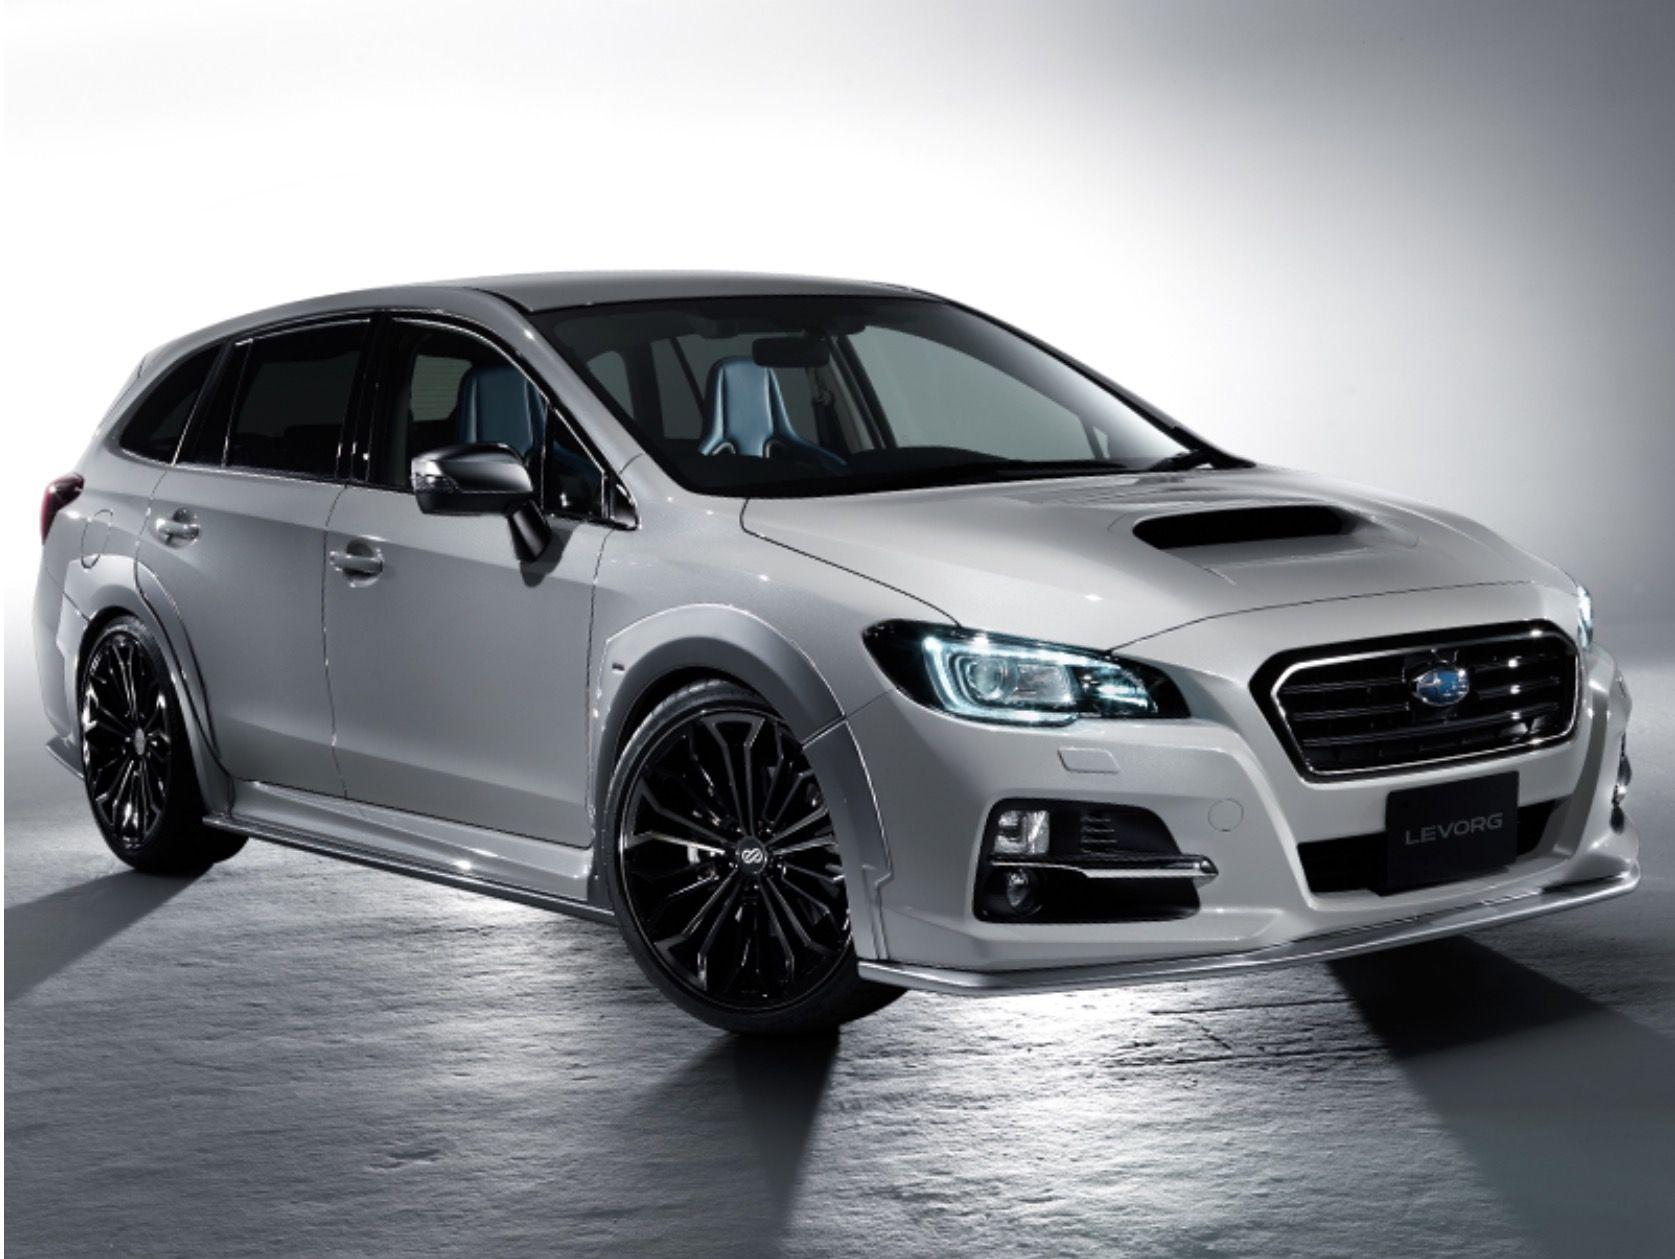 18 Subaru Levorg Ideas Subaru Levorg Subaru Wrx